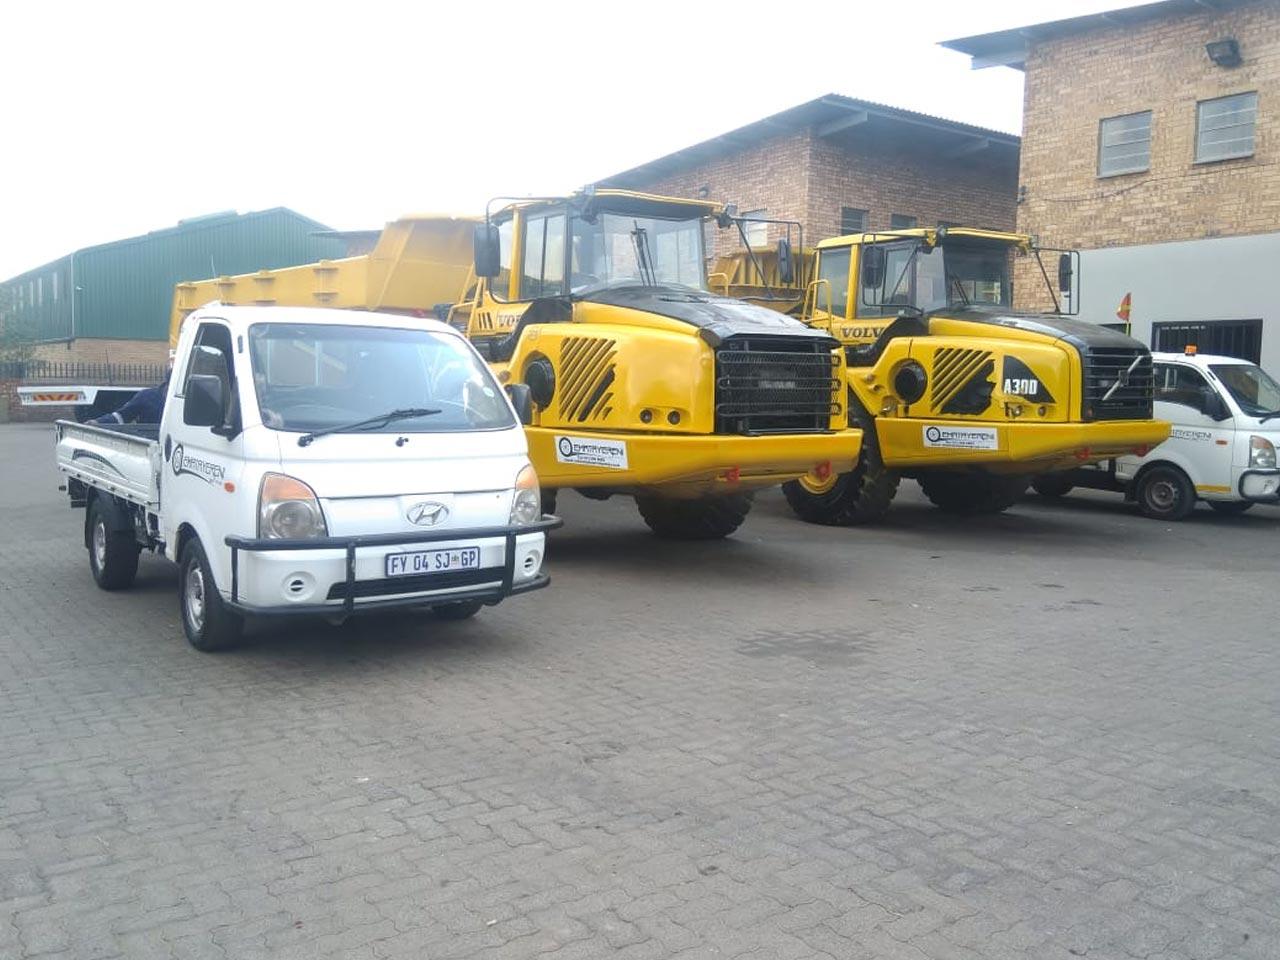 Contact Us Petroleum Coke Company Pty Ltd Mail: Ematayereni Group (Pty) Ltd